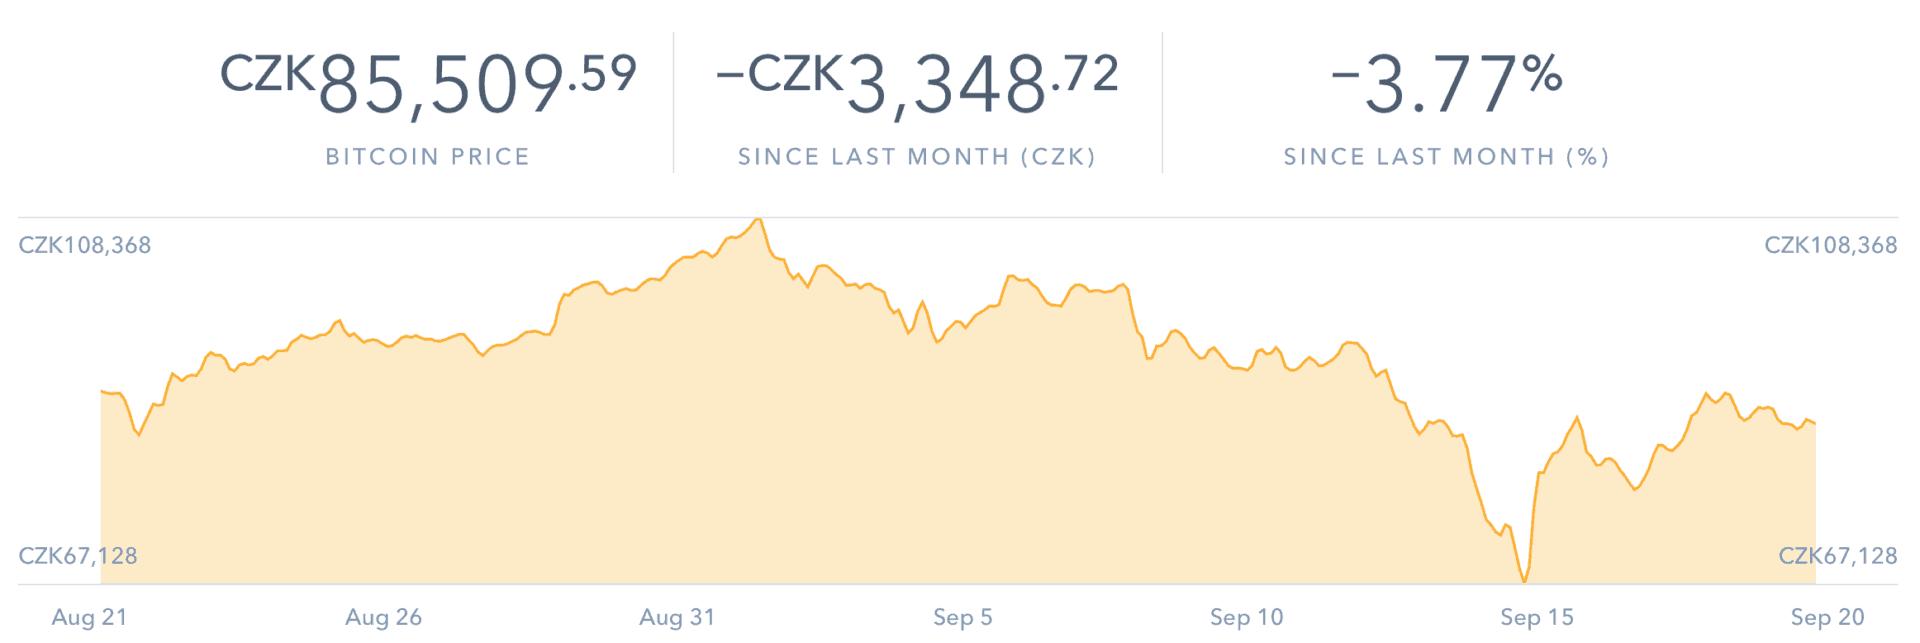 Cena Bitcoinu s převodem na CZK (Datum: 20.9.2017)